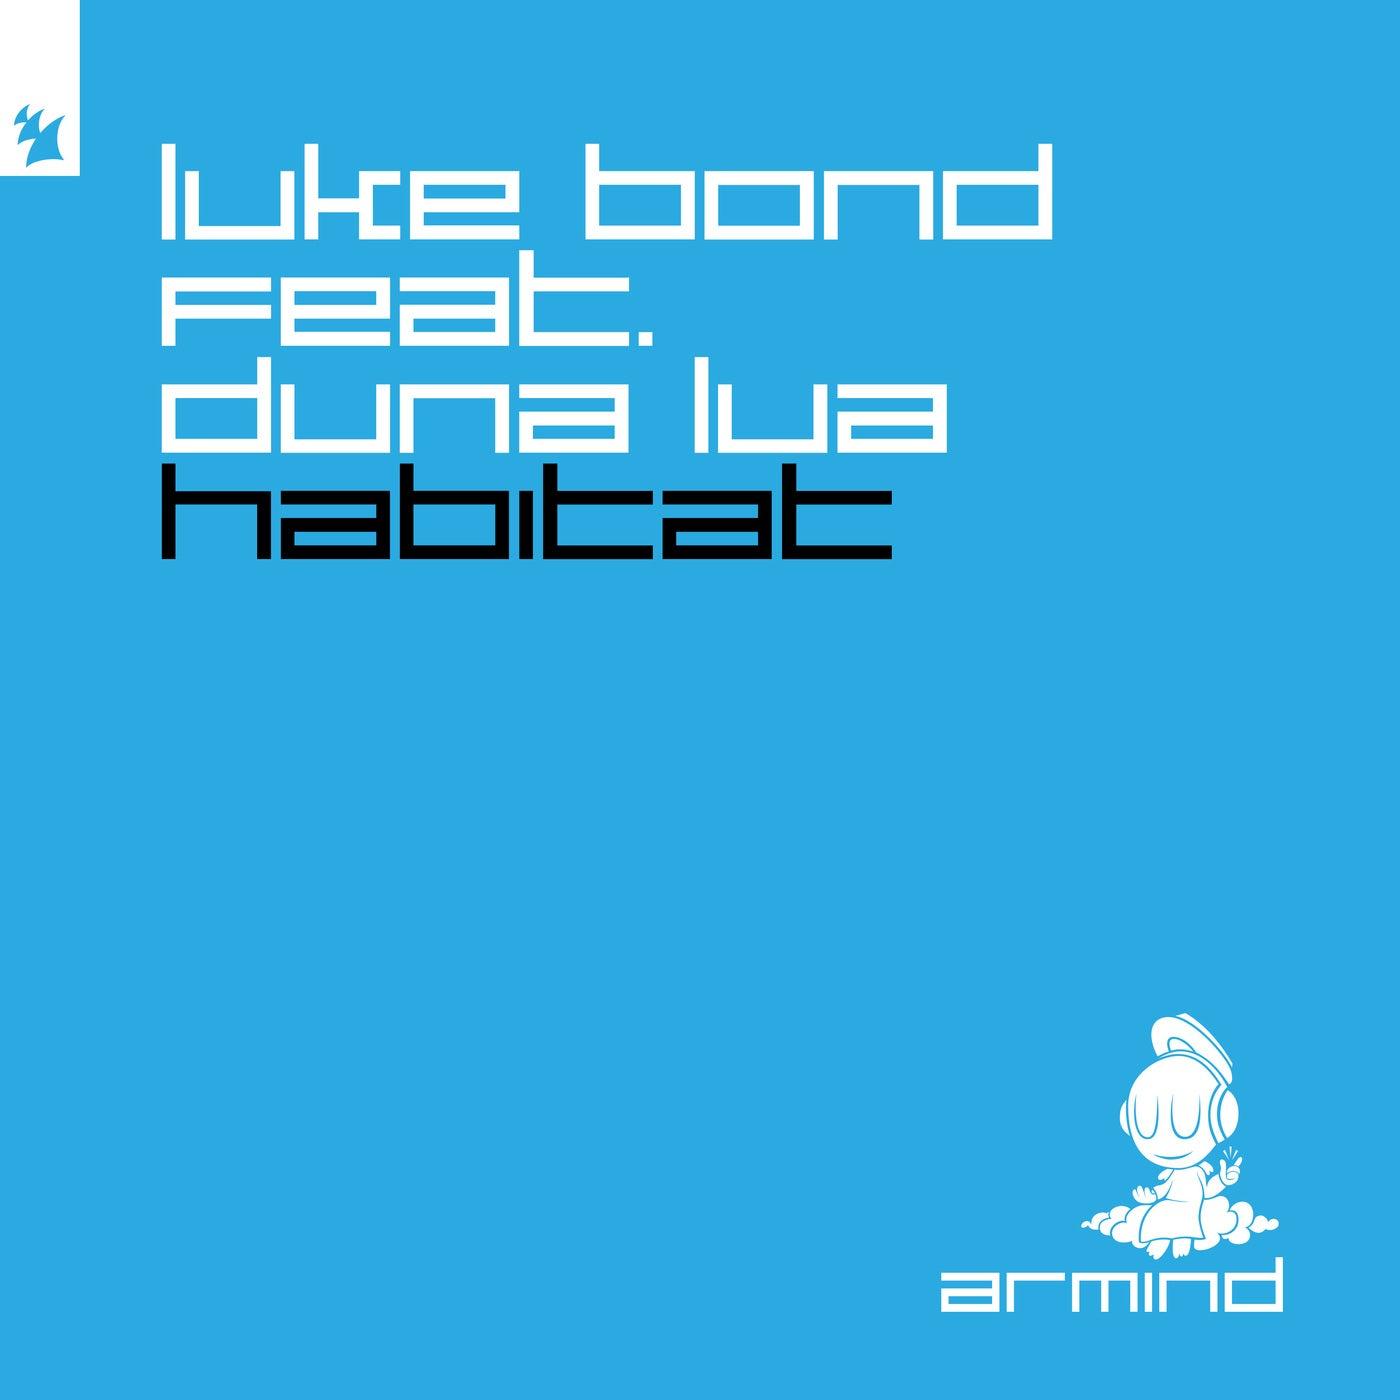 Habitat feat. Duna Lua (Extended Mix)